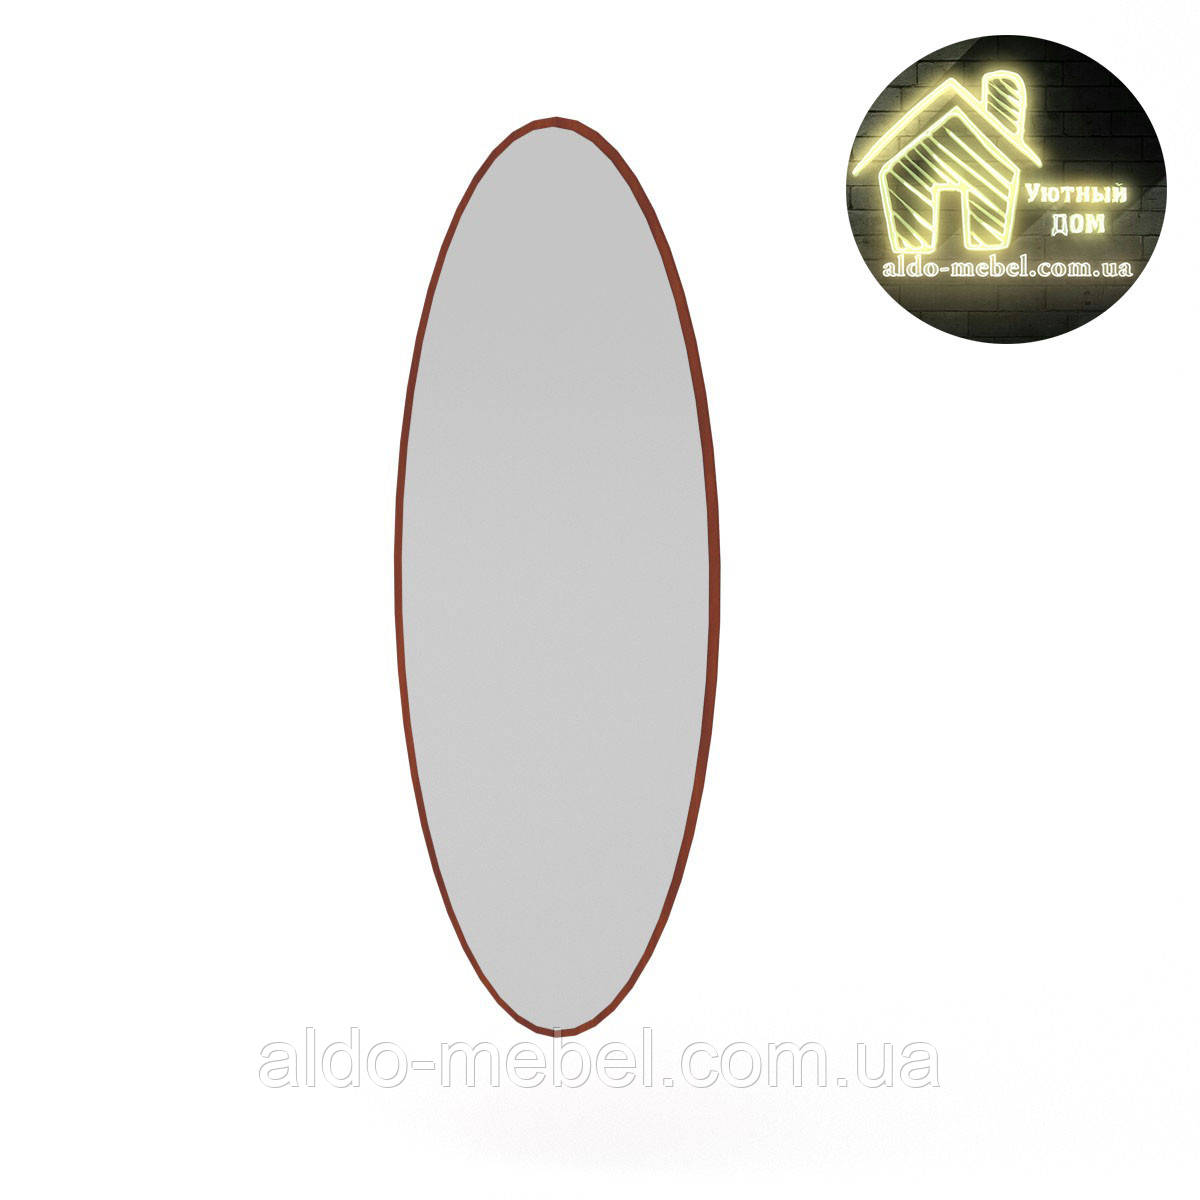 Зеркало - 1 Габариты: Ш - 360 мм; В - 1020 мм; Г - 20 мм.(Компанит)